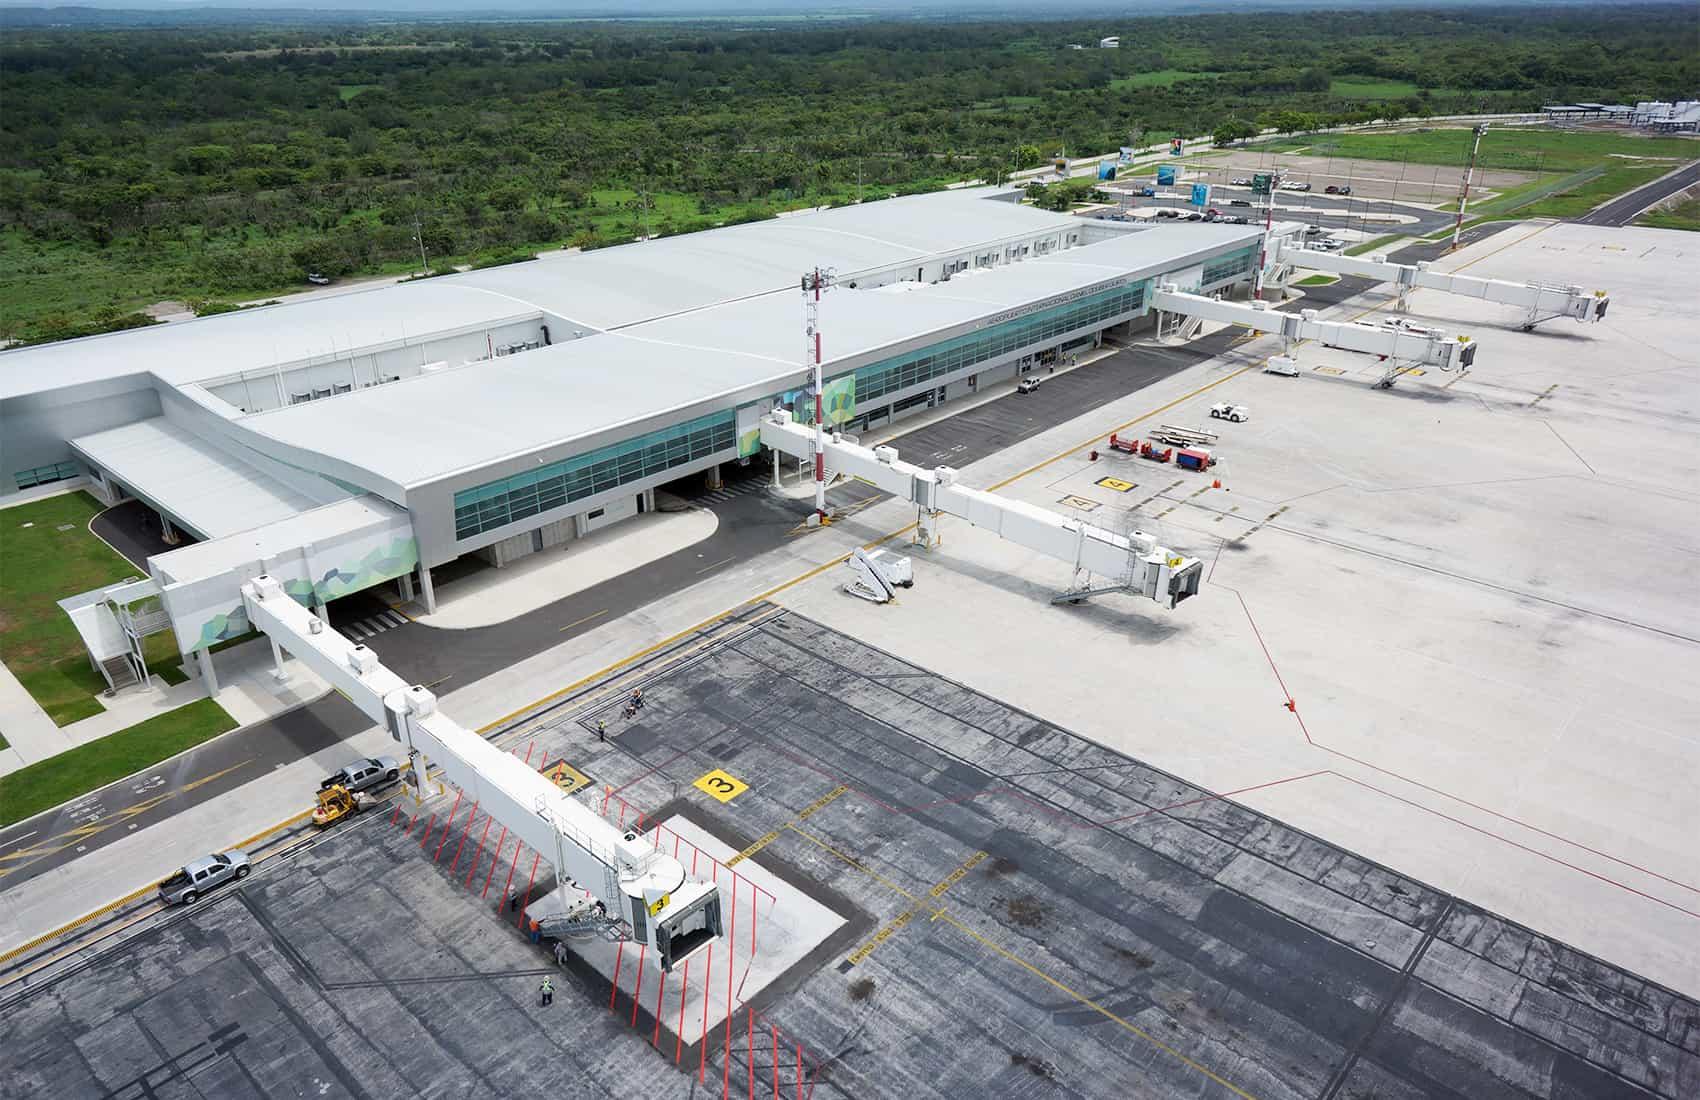 Daniel Oduber Quirós International Airport (LIR). Liberia, Guanacaste